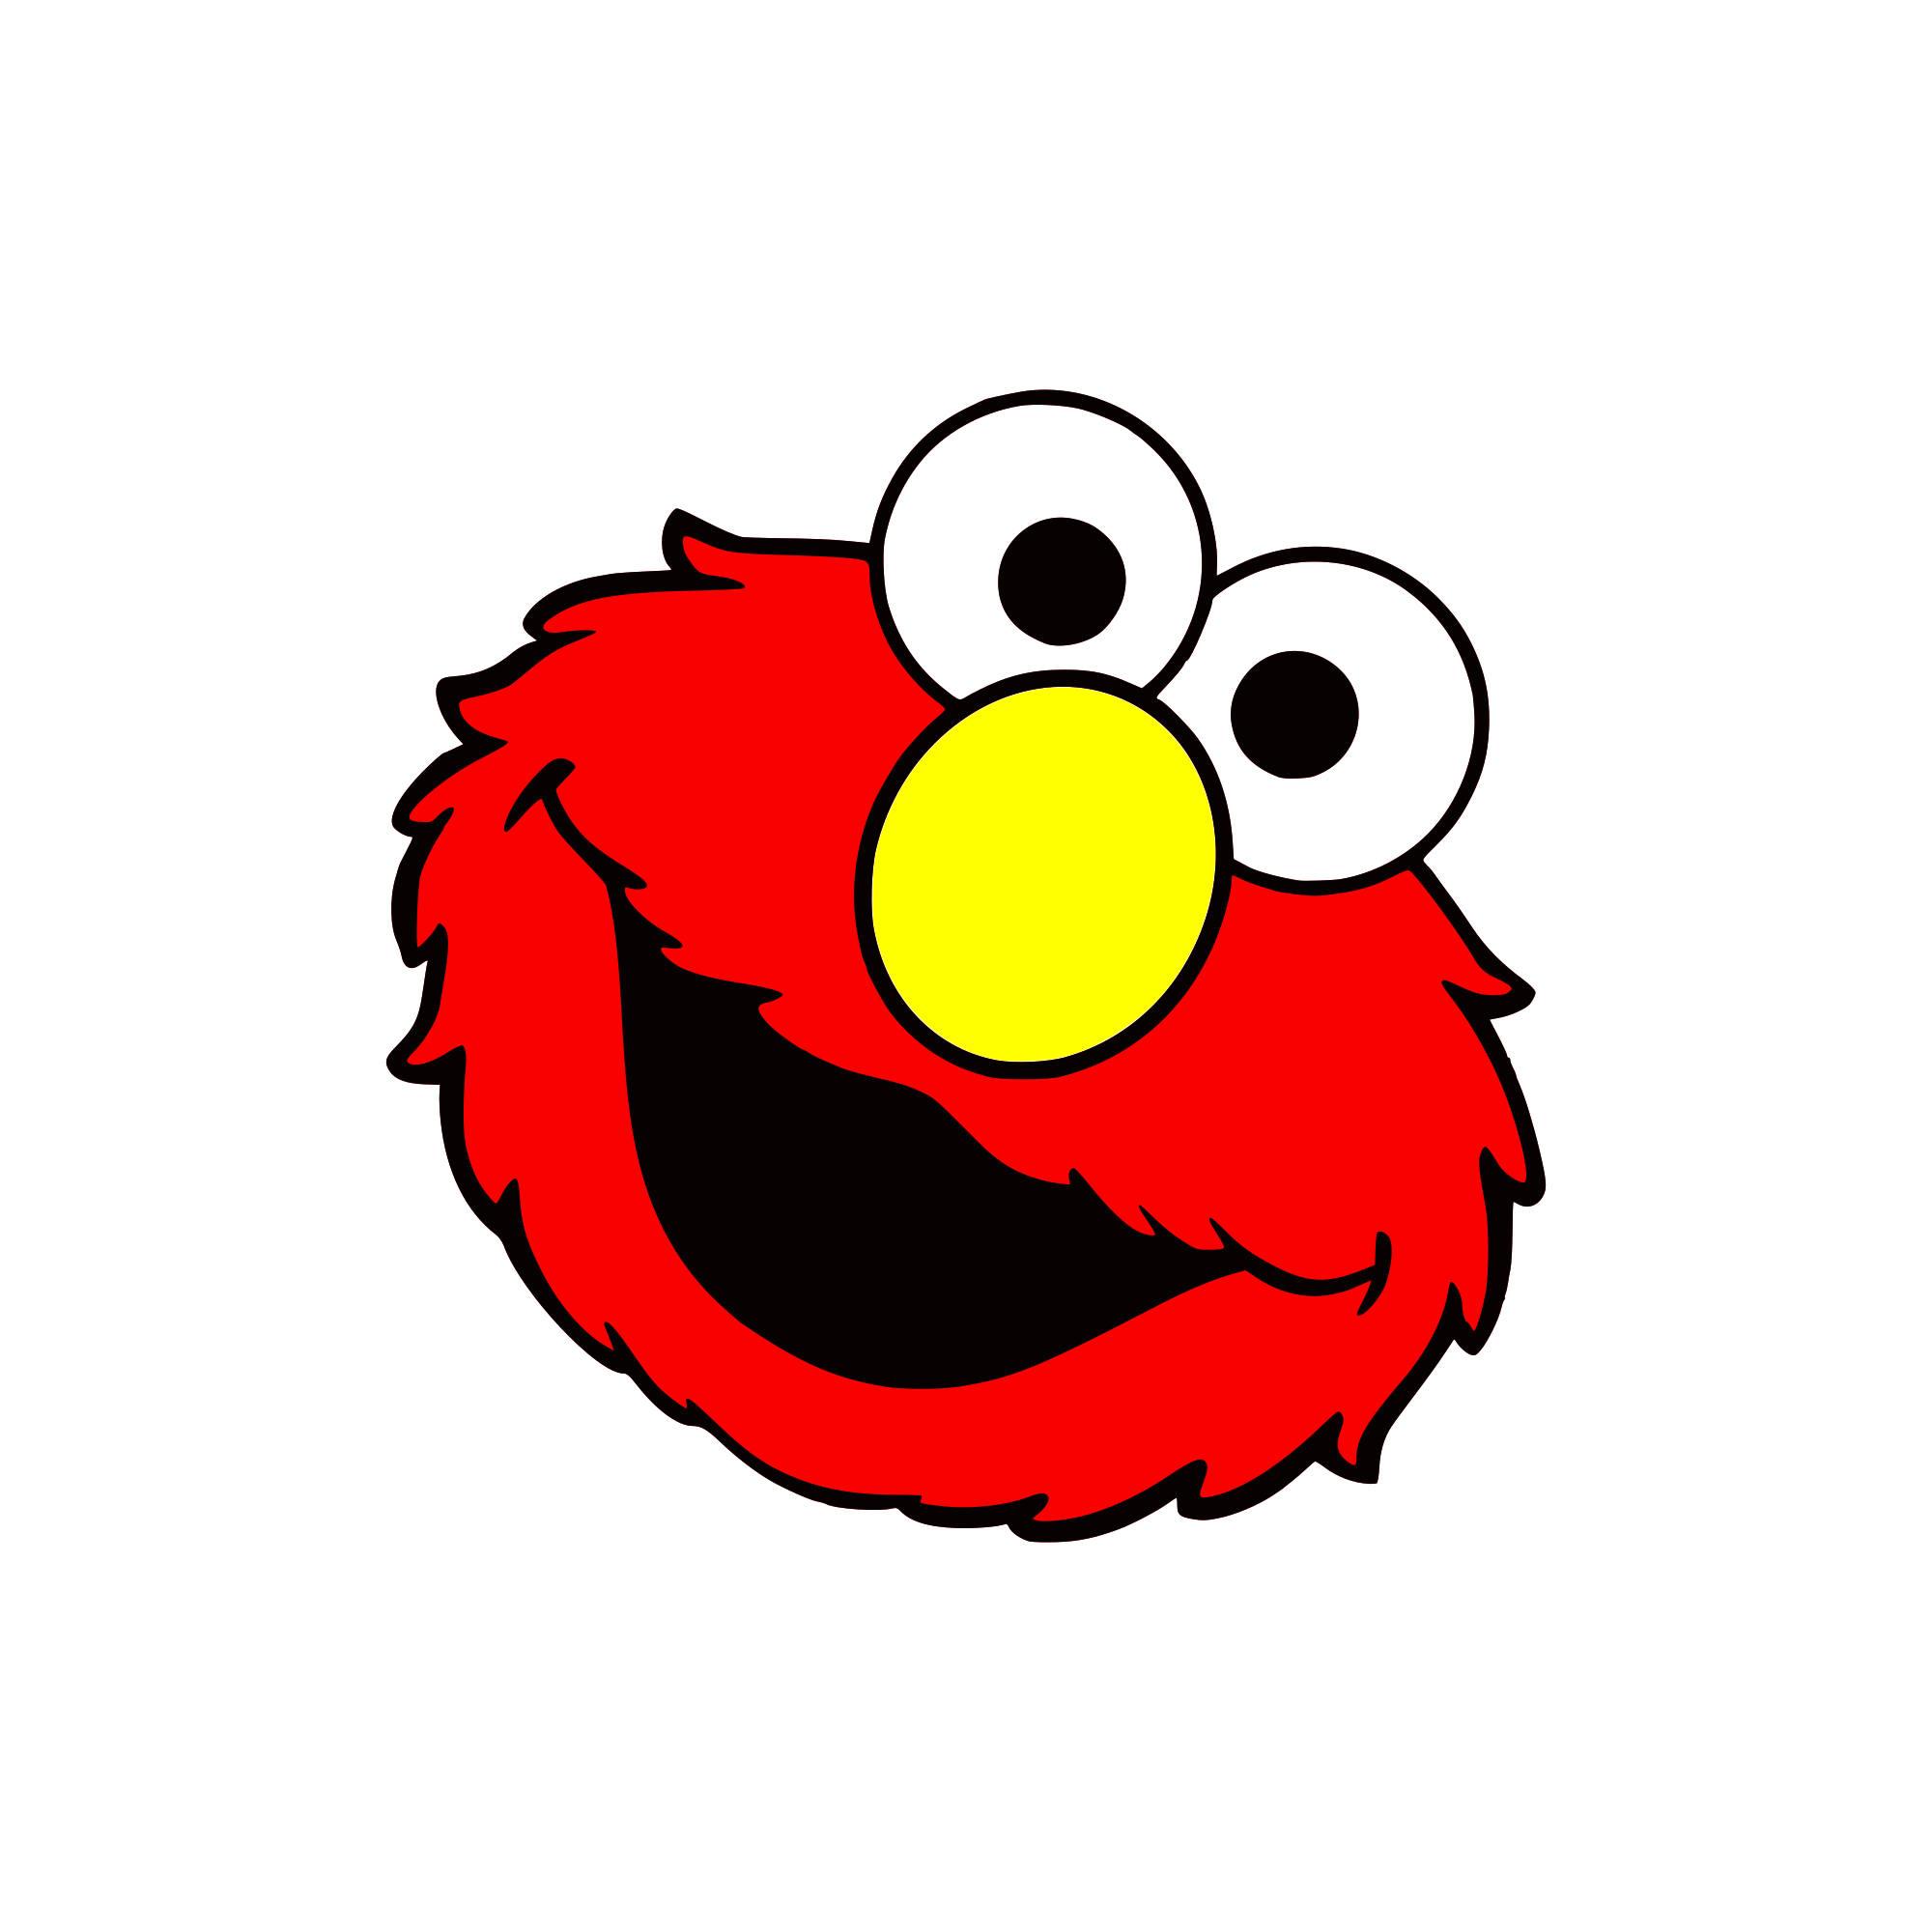 Elmo Face Clipart at GetDrawings.com.